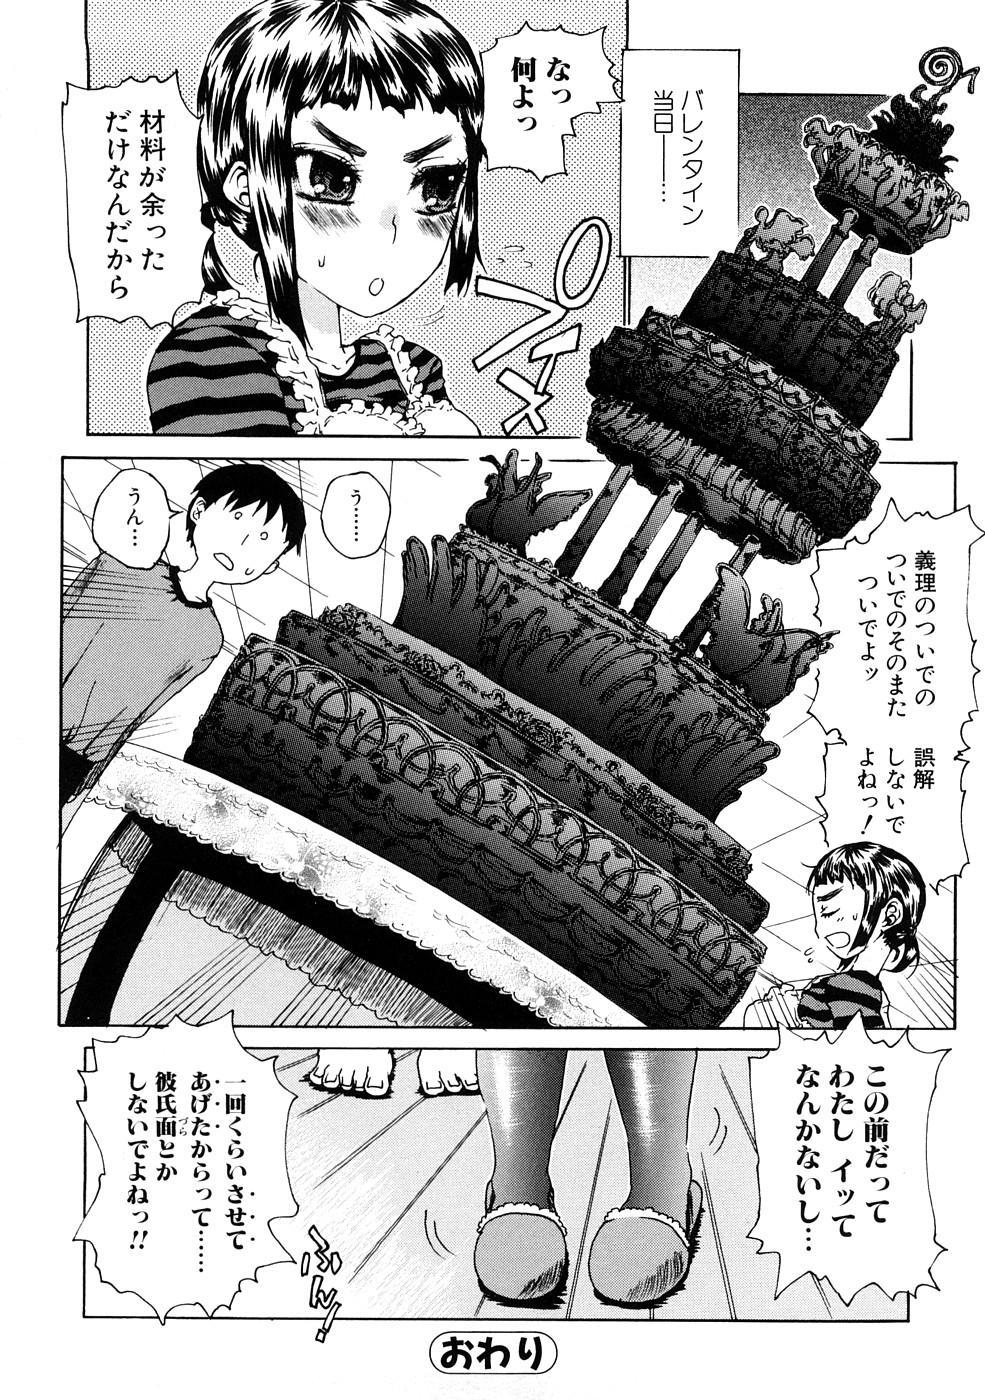 Ecchi de Jibunkatte de Kawaii Ko 113